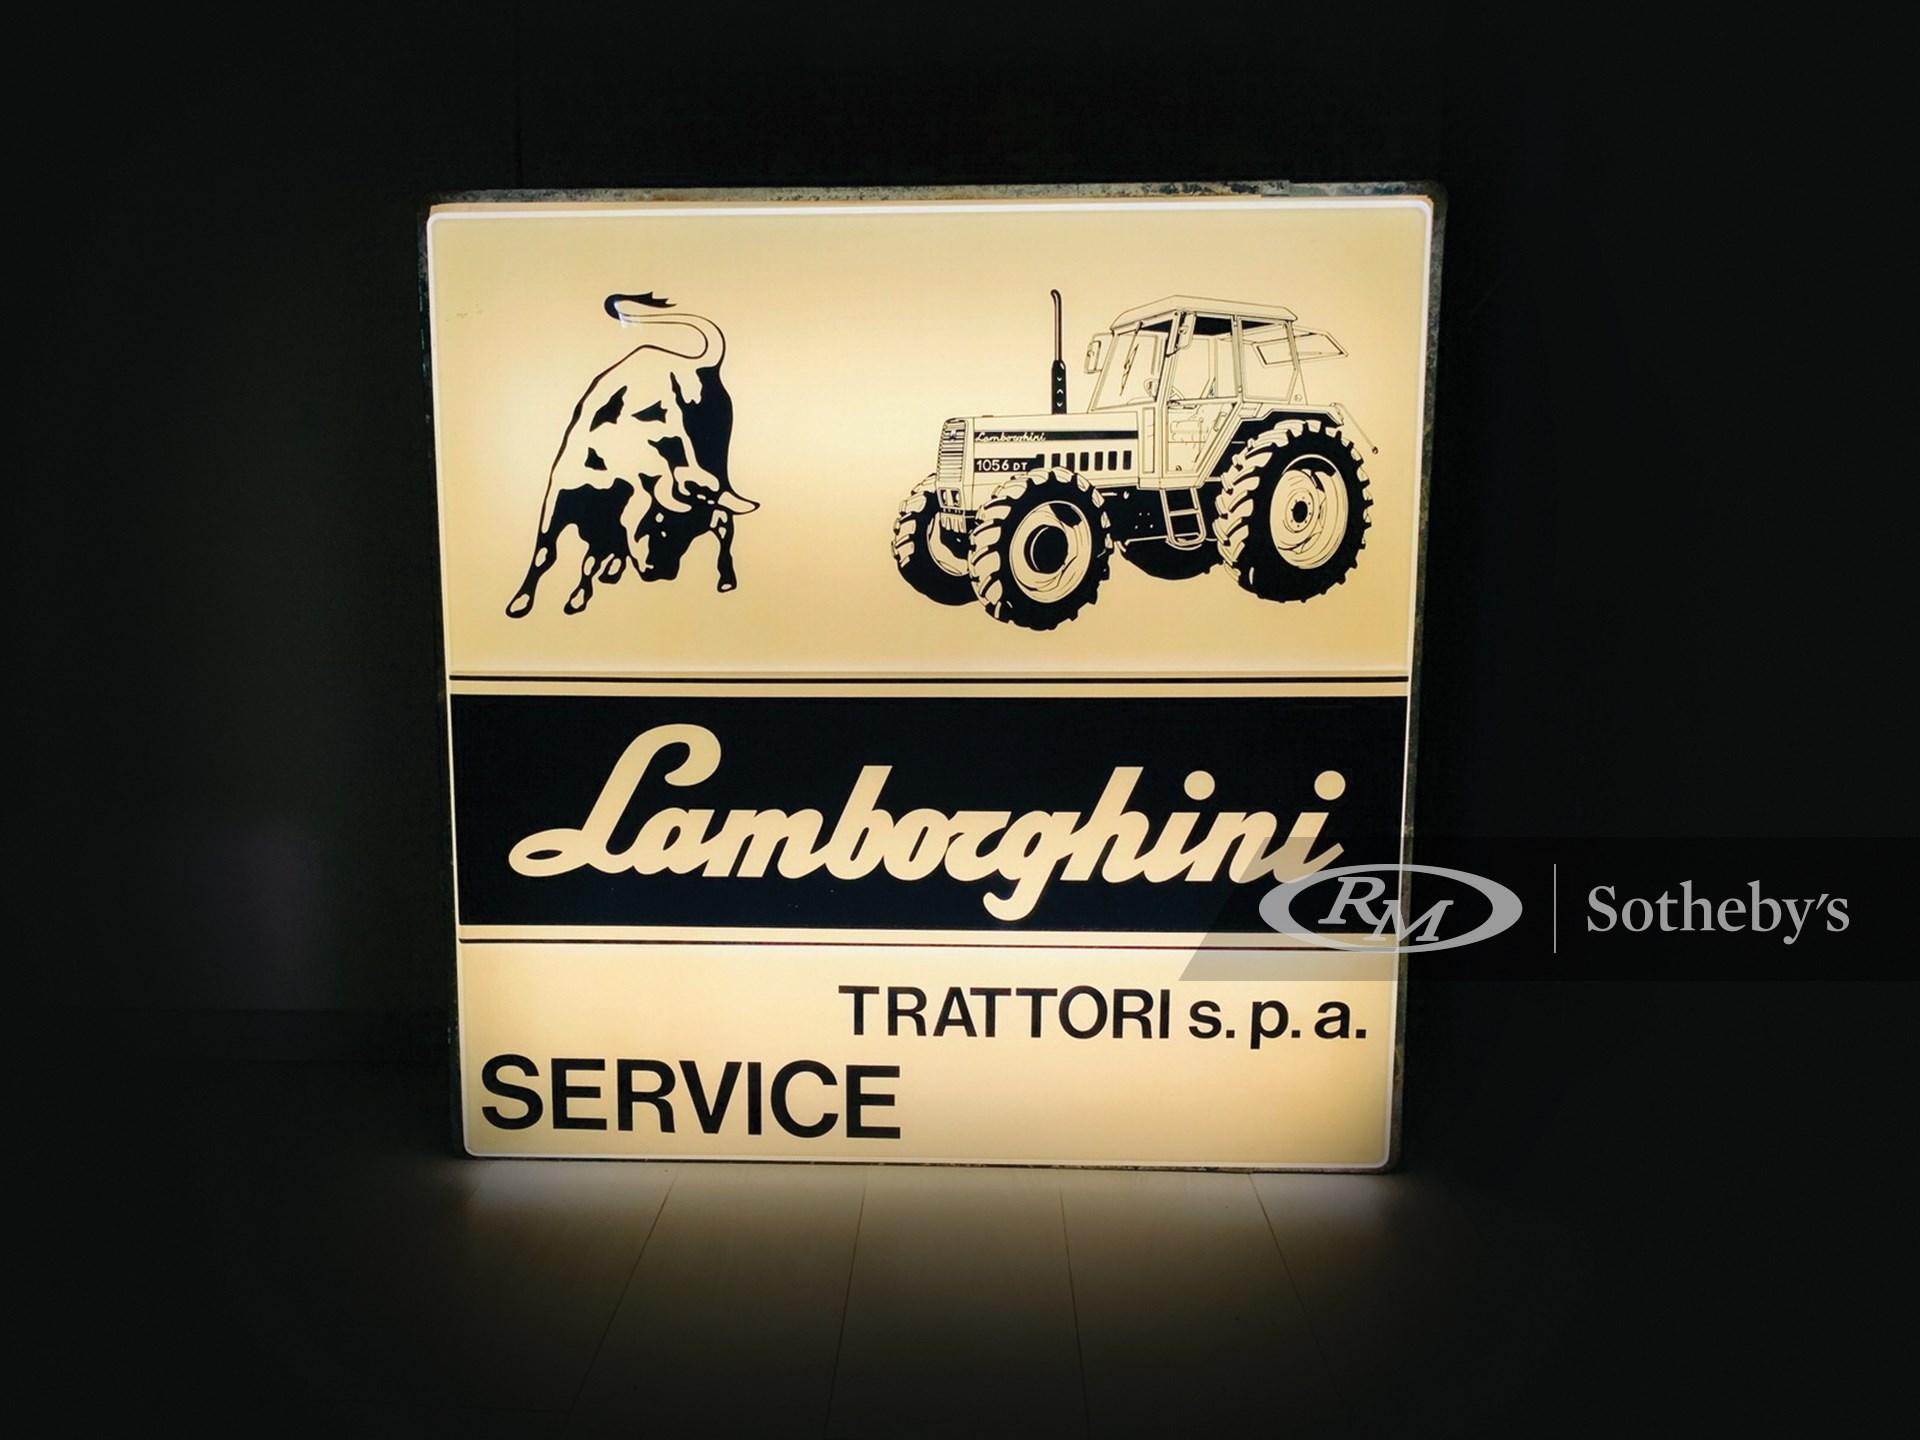 Lamborghini Illuminated Dealership Sign, ca. 1960s -